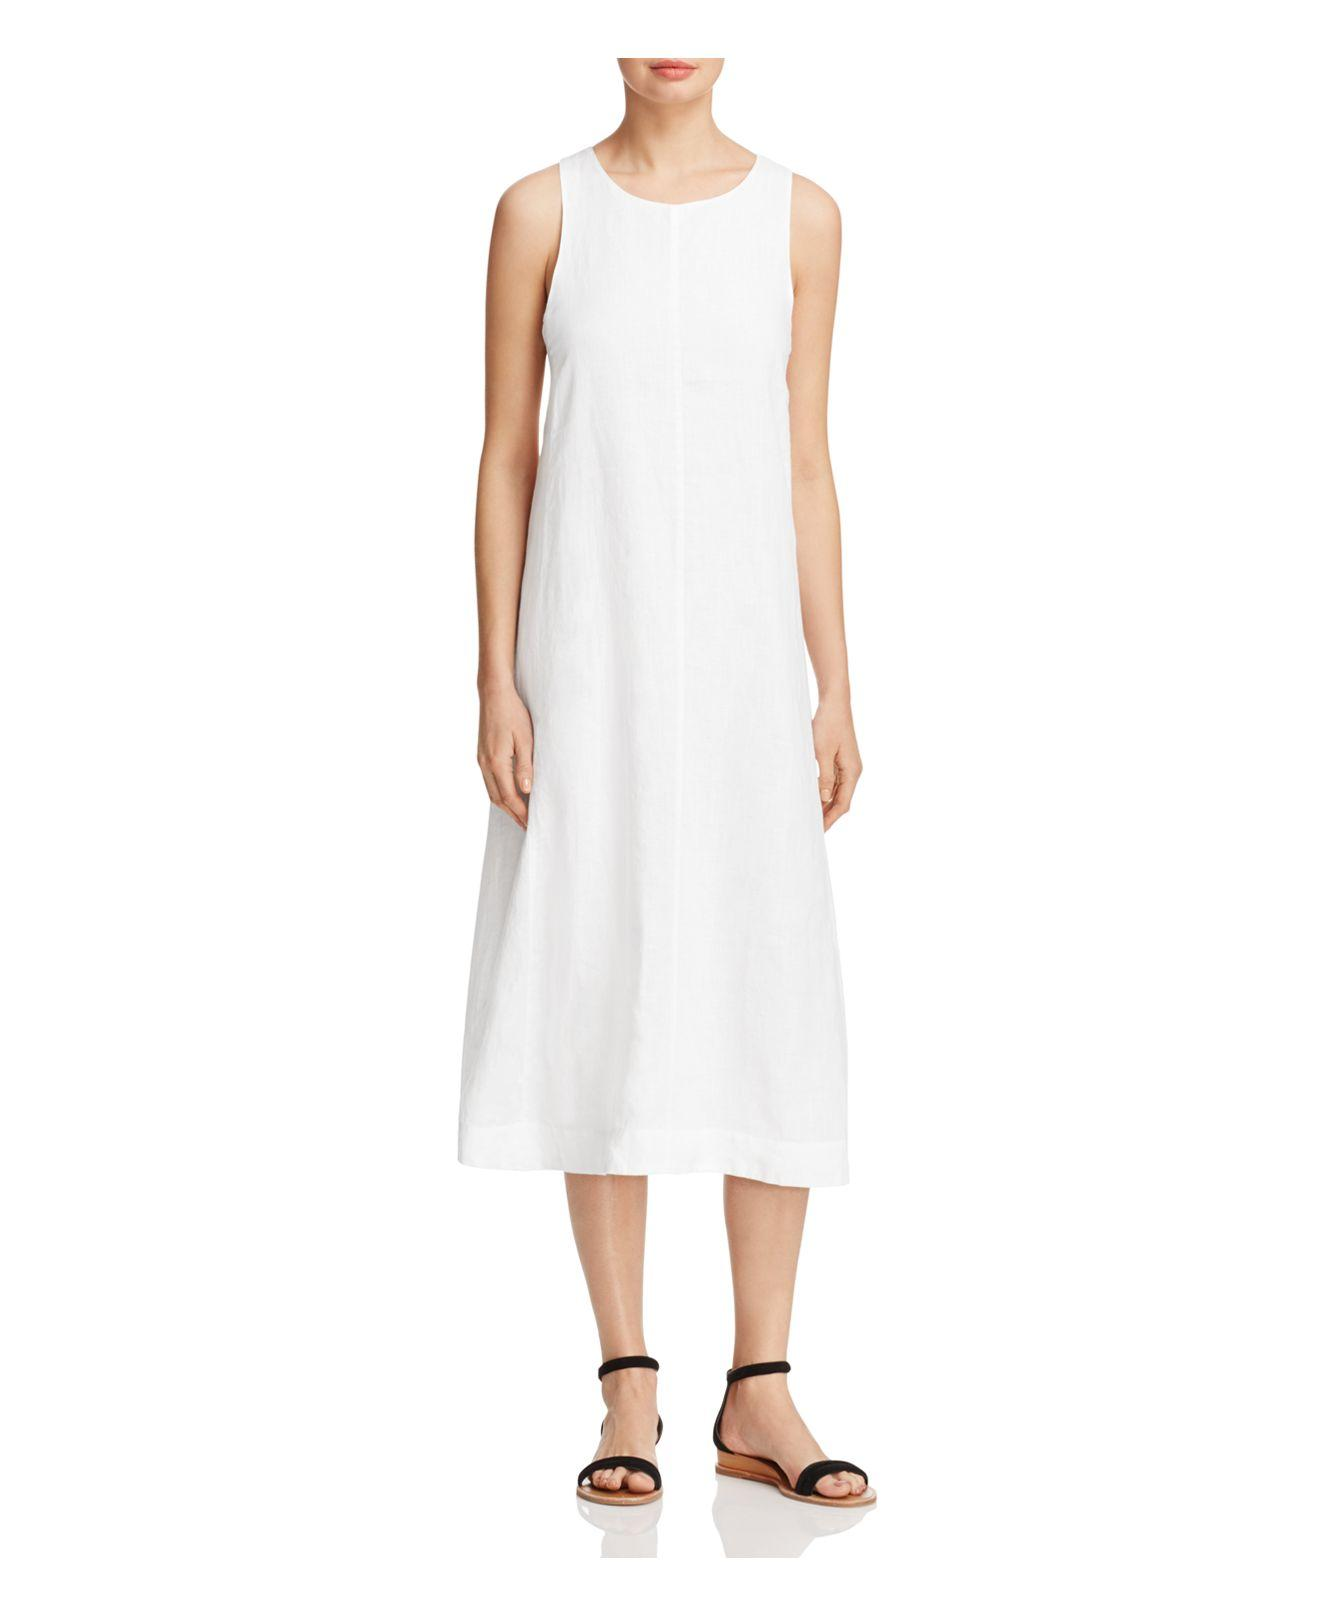 Organic Linen Clothing Uk